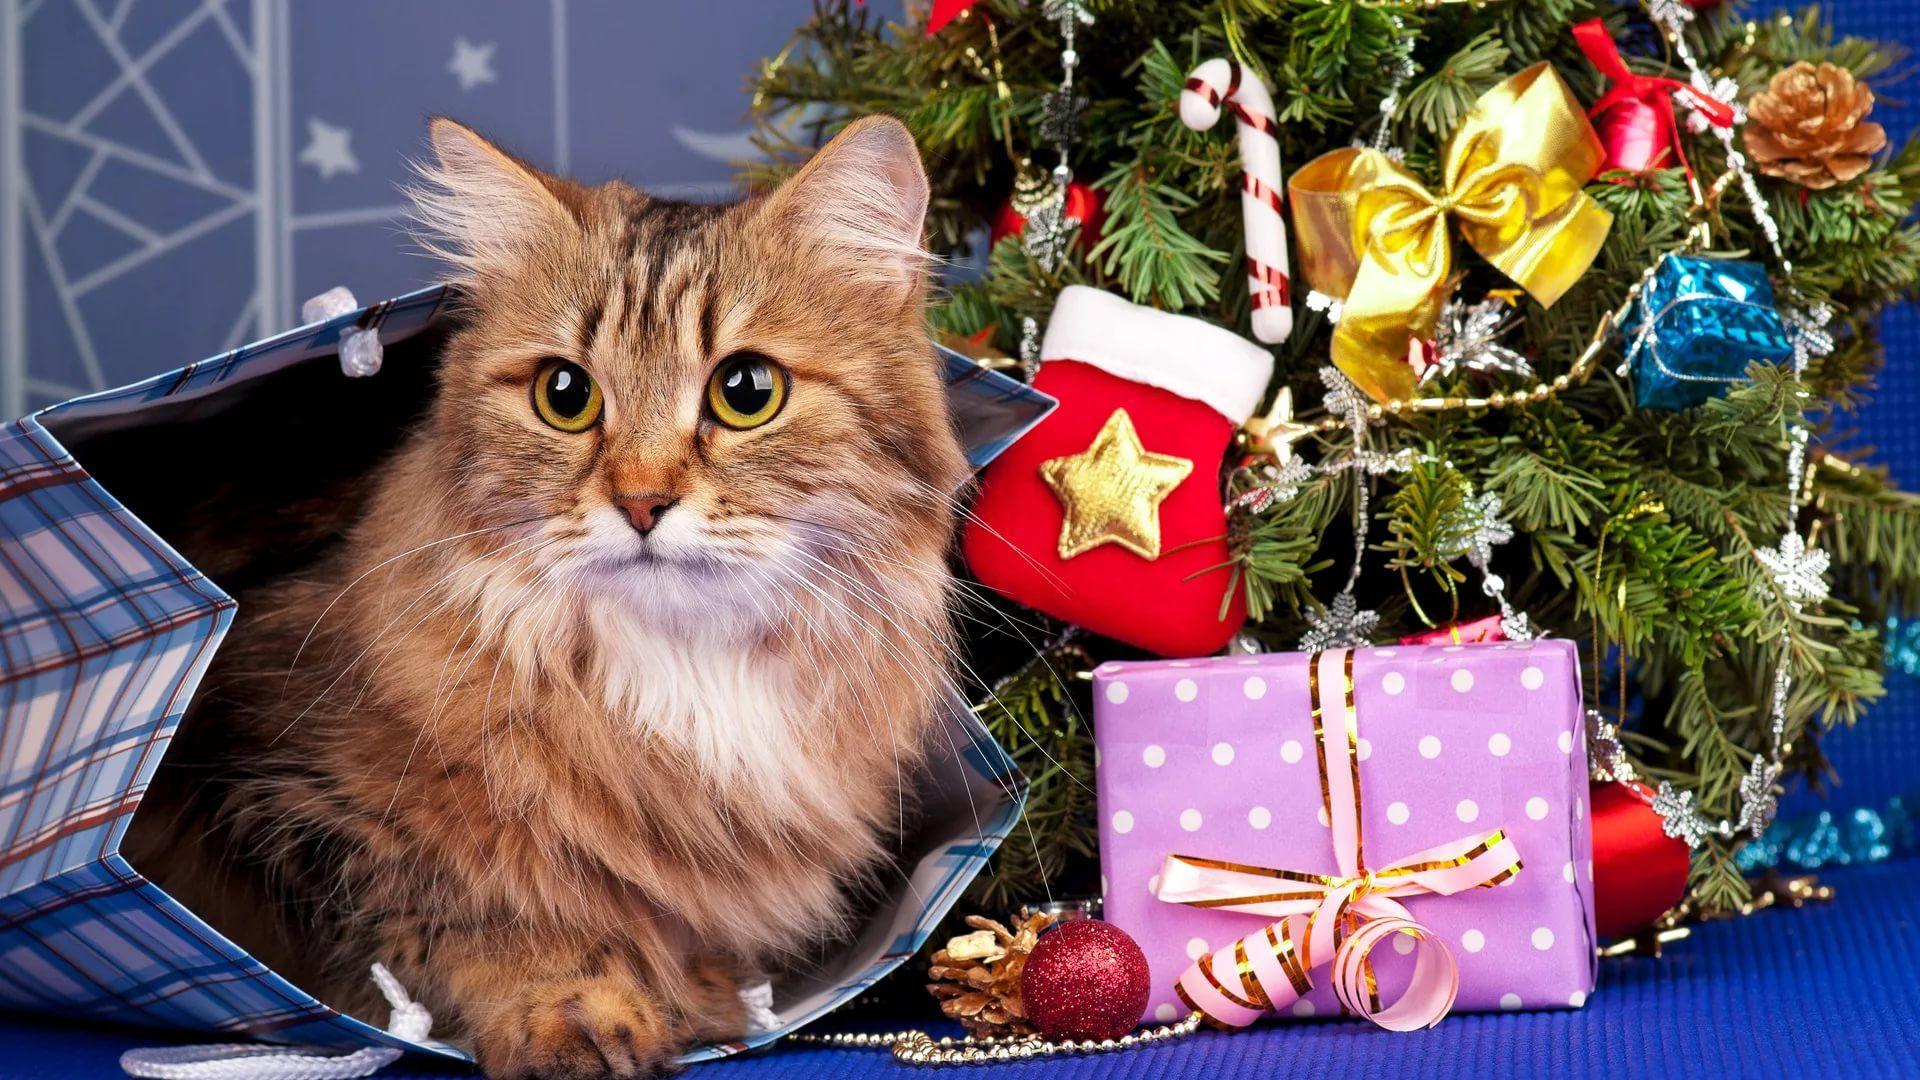 Christmas Cat Free Desktop Wallpaper